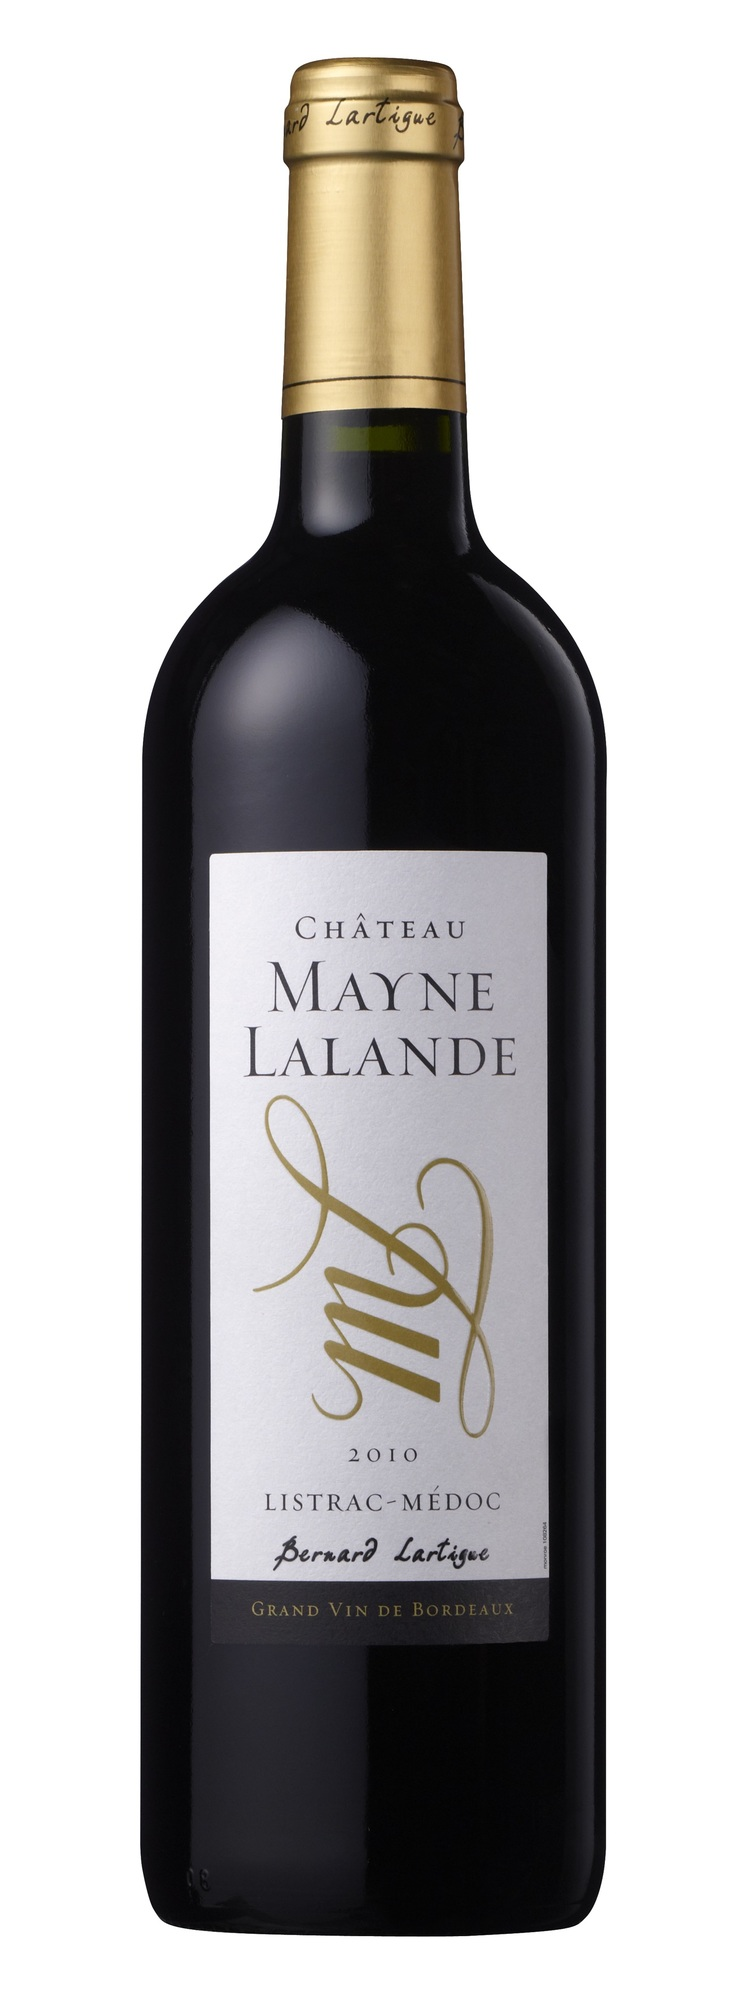 Bouteille Château mayne-Lalande